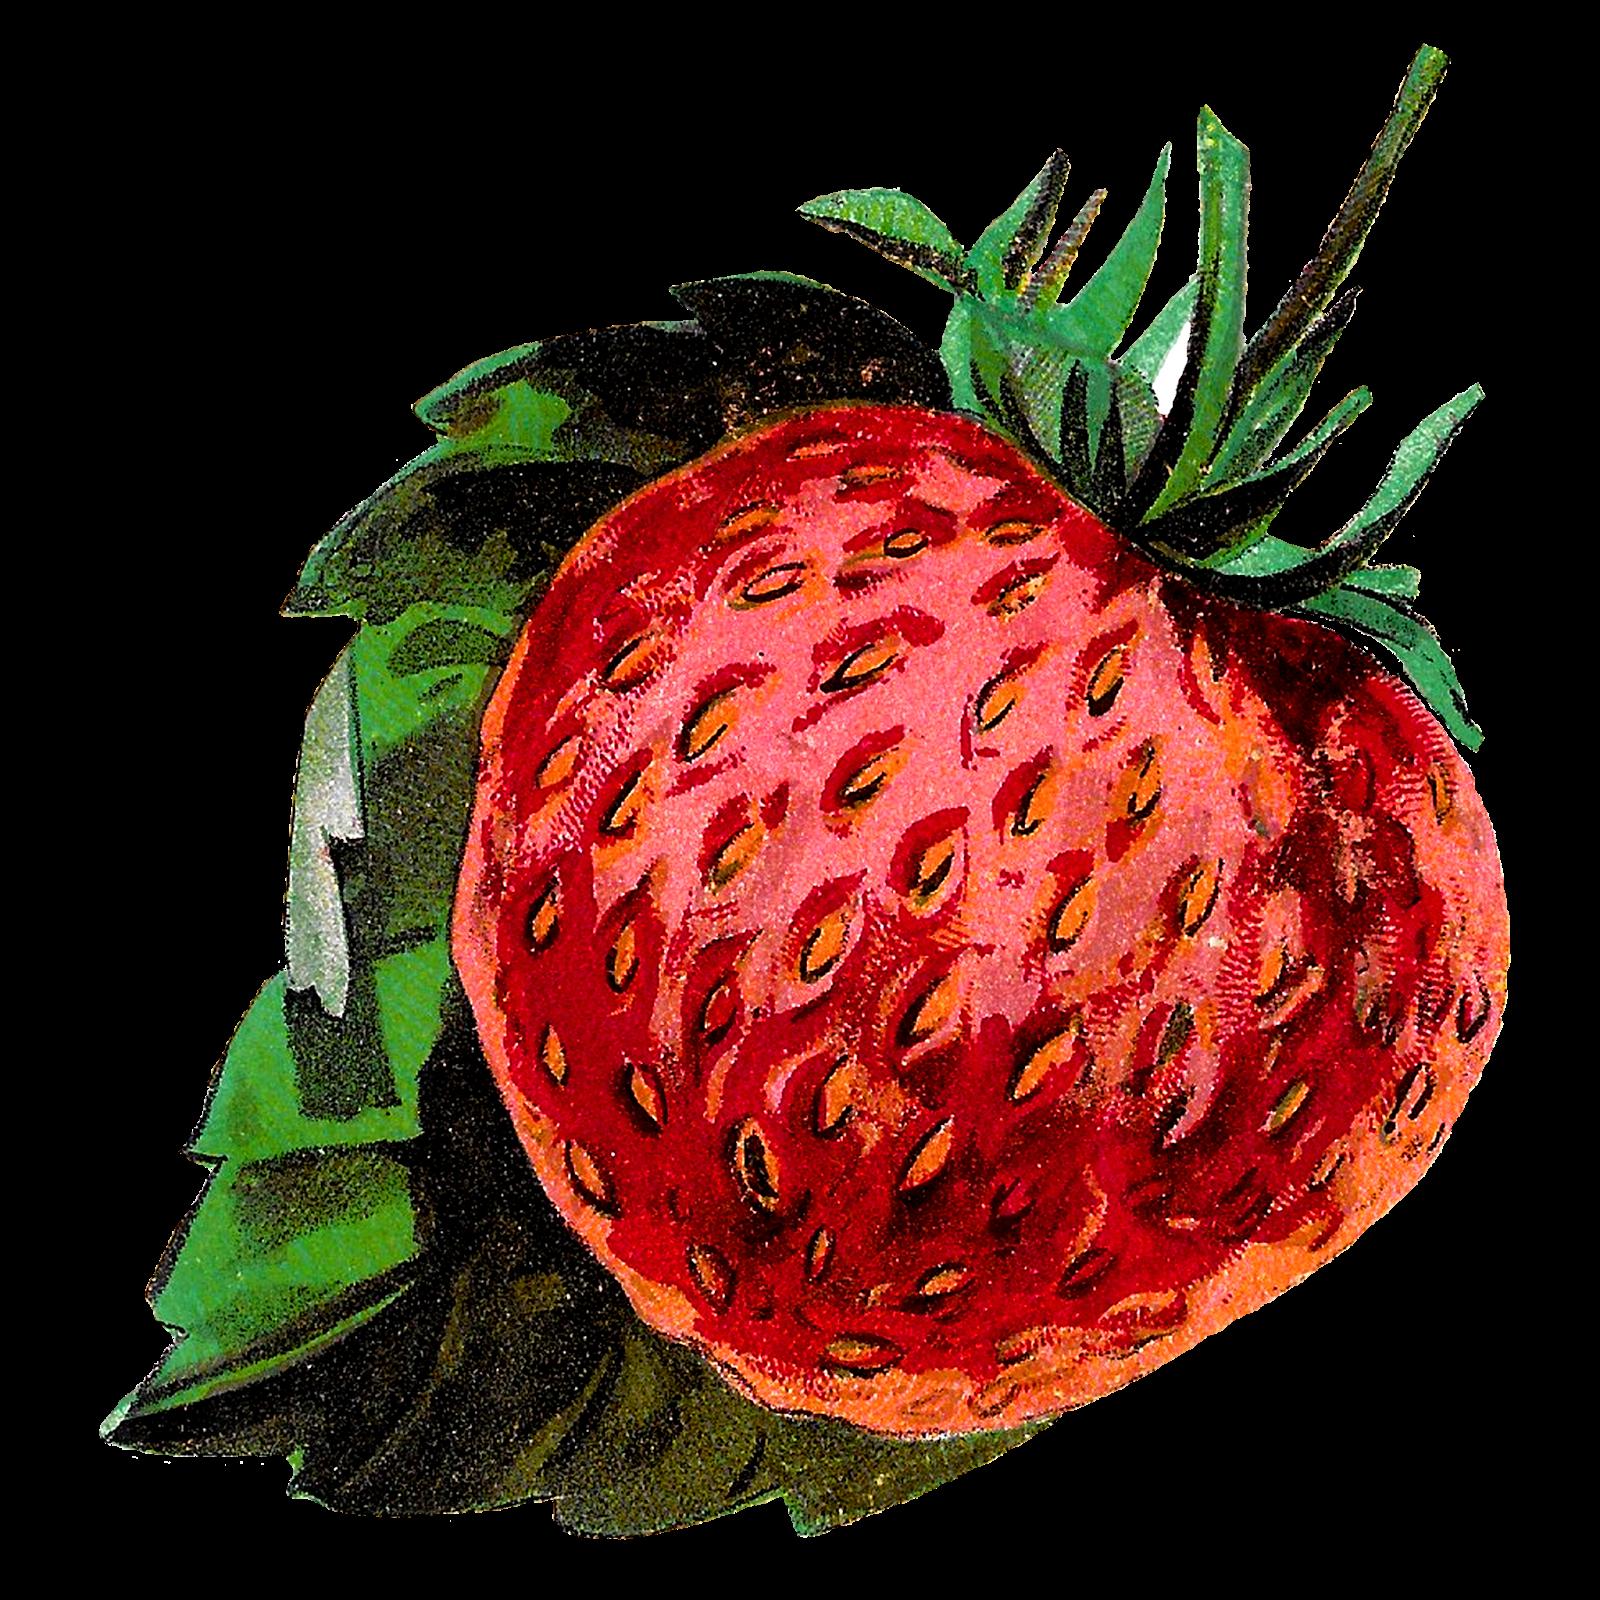 Antique images fruit stock. Strawberries clipart jar